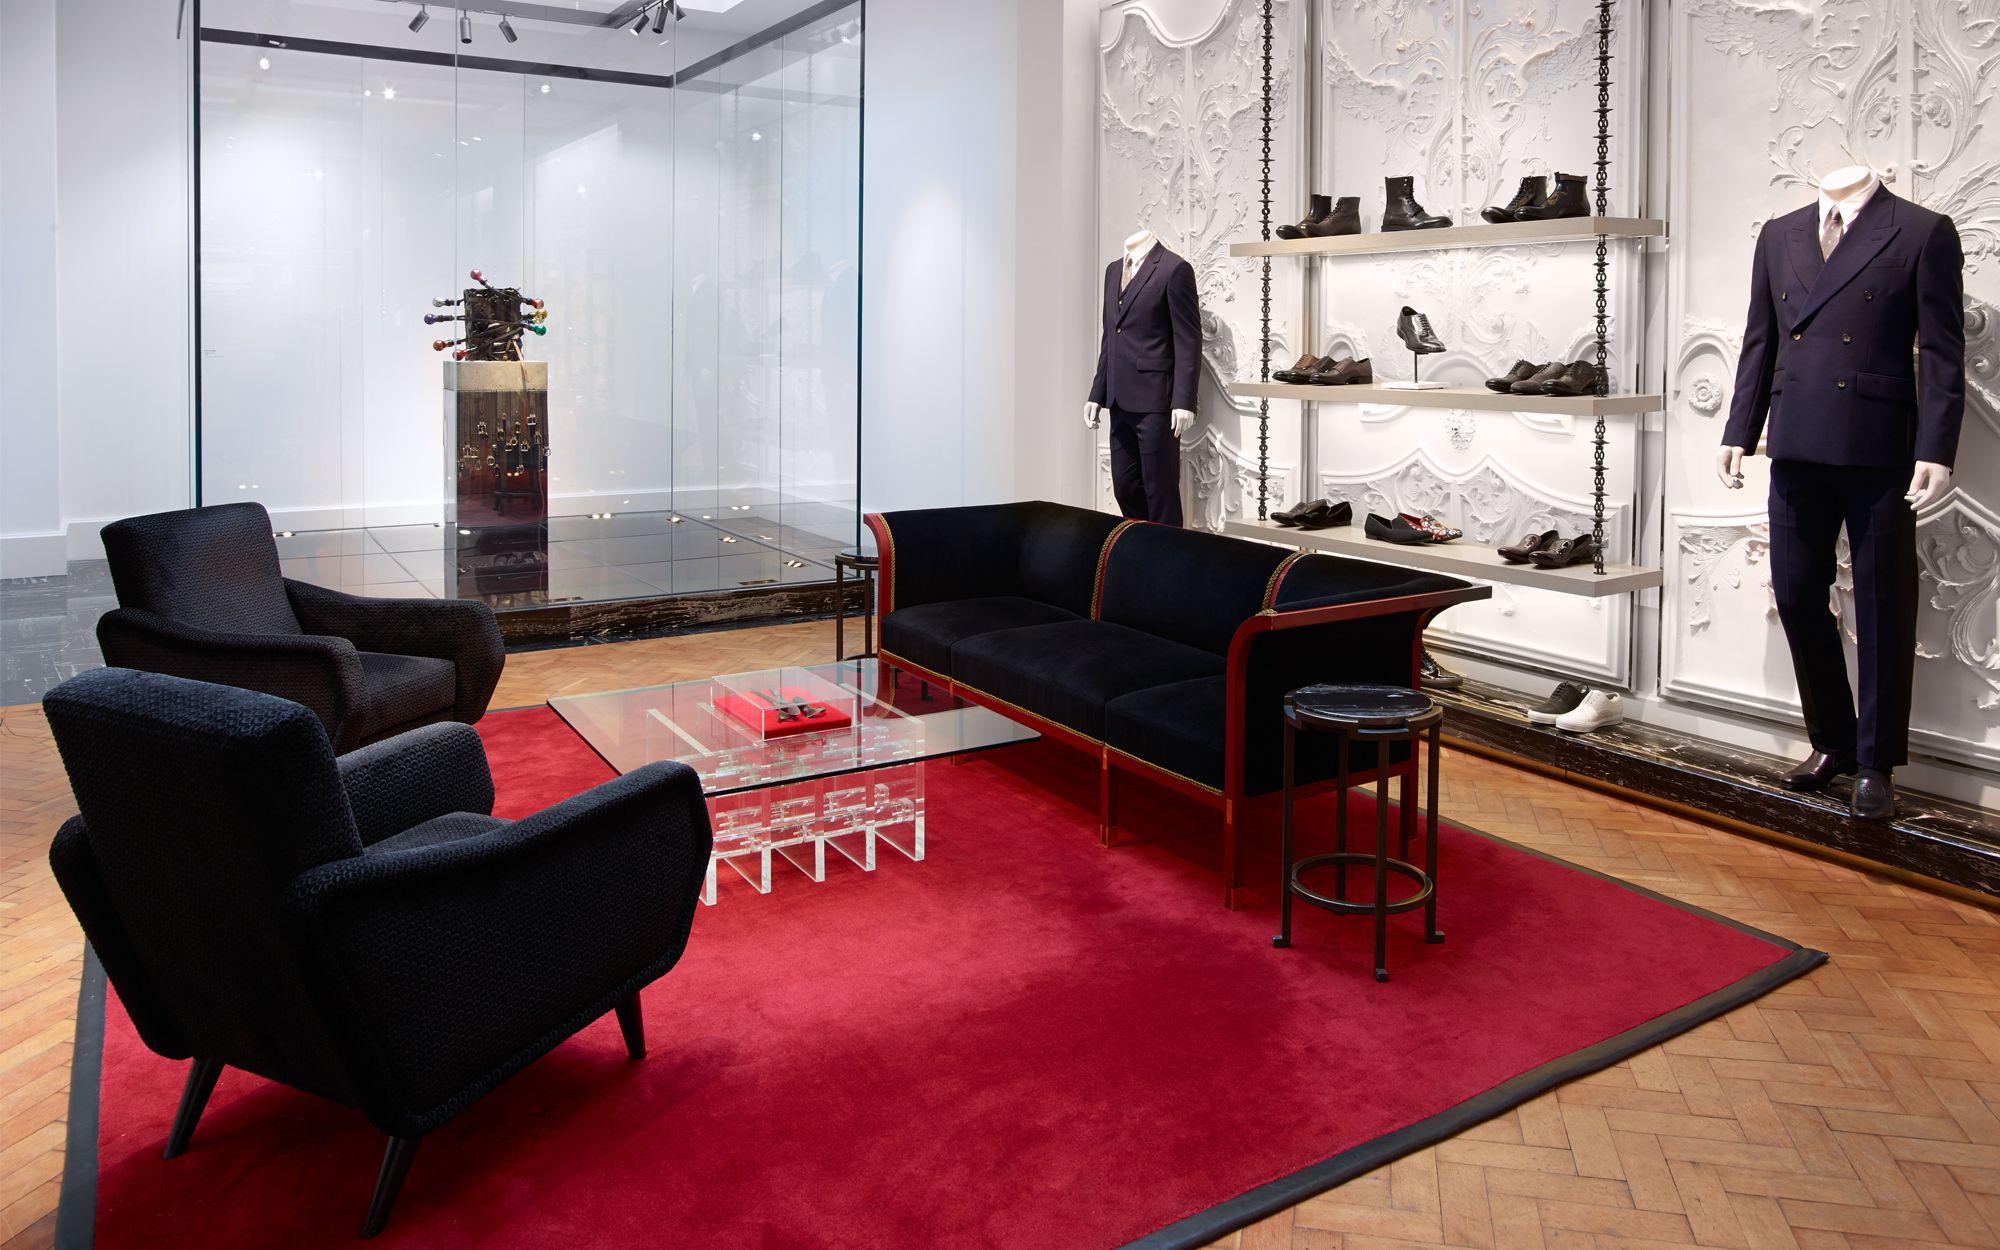 10 top contemporary interior designers - David Collins. Feel inspired: www.luxxu.net | #interiordesign #bestinteriordesigners #marmolradziner #bespoke #contemporarydesign